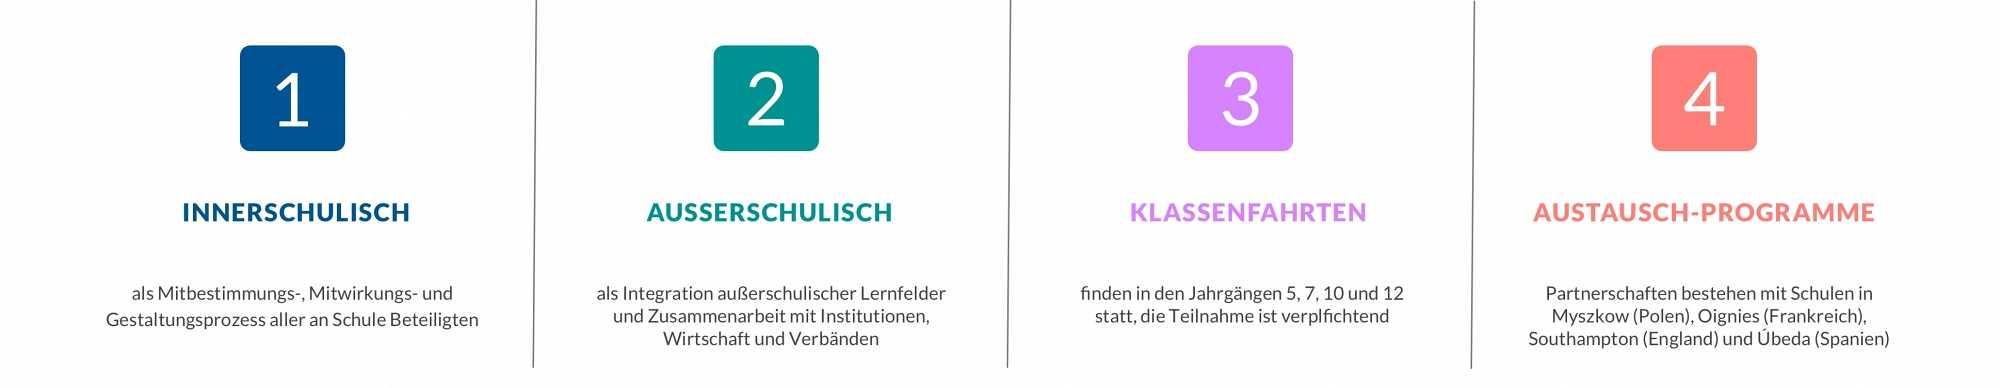 Fein 12 Jahre Schule Bilderrahmen Galerie - Badspiegel Rahmen Ideen ...